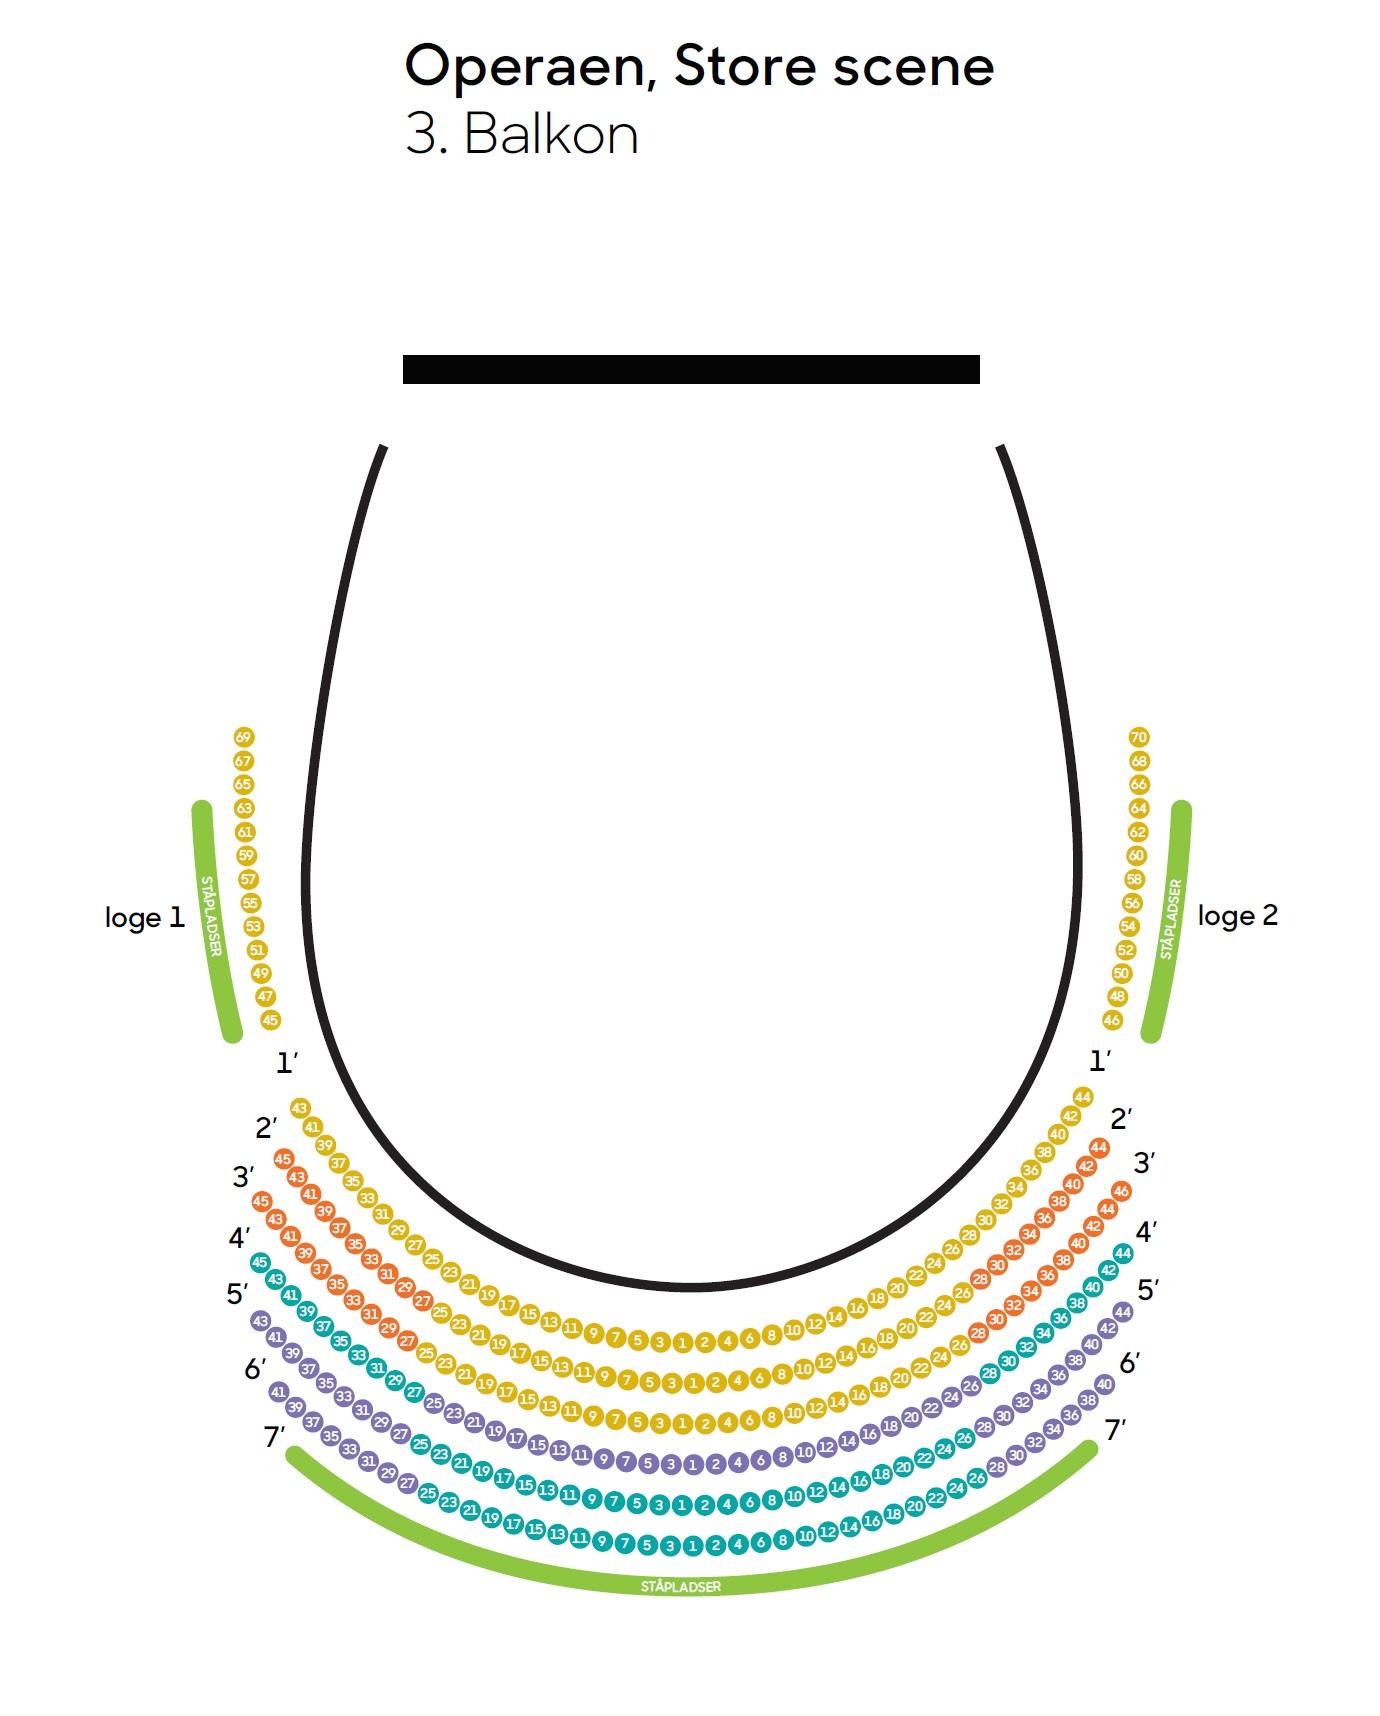 Схема зала Оперного театра Копенгагена - балкон, Основная сцена